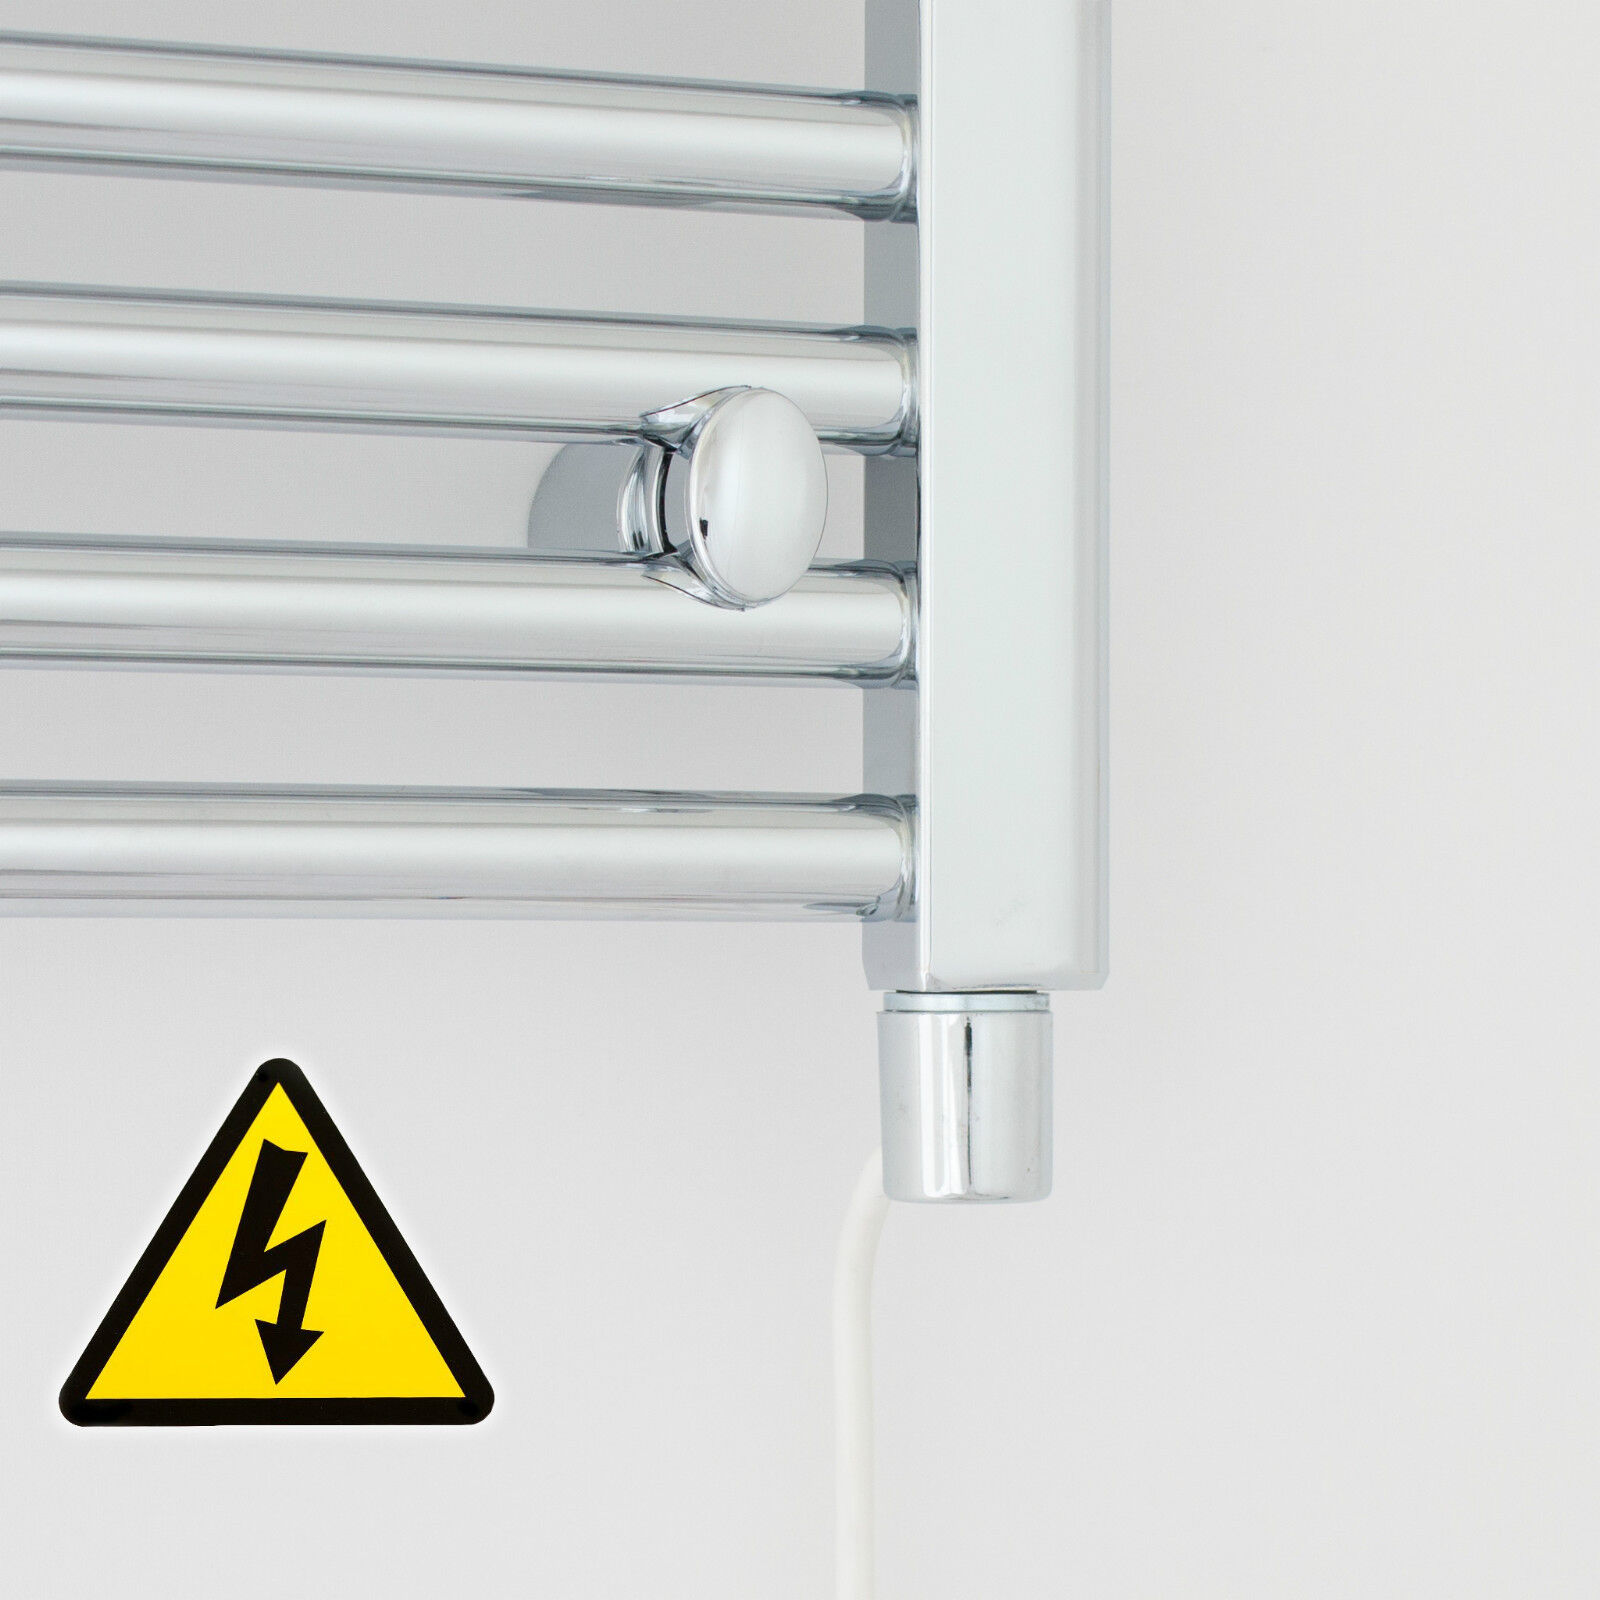 1000 mm High 850 mm Wide Wide Wide Straight Chrome Heated Towel Rail Radiator Bathroom Rad b98765